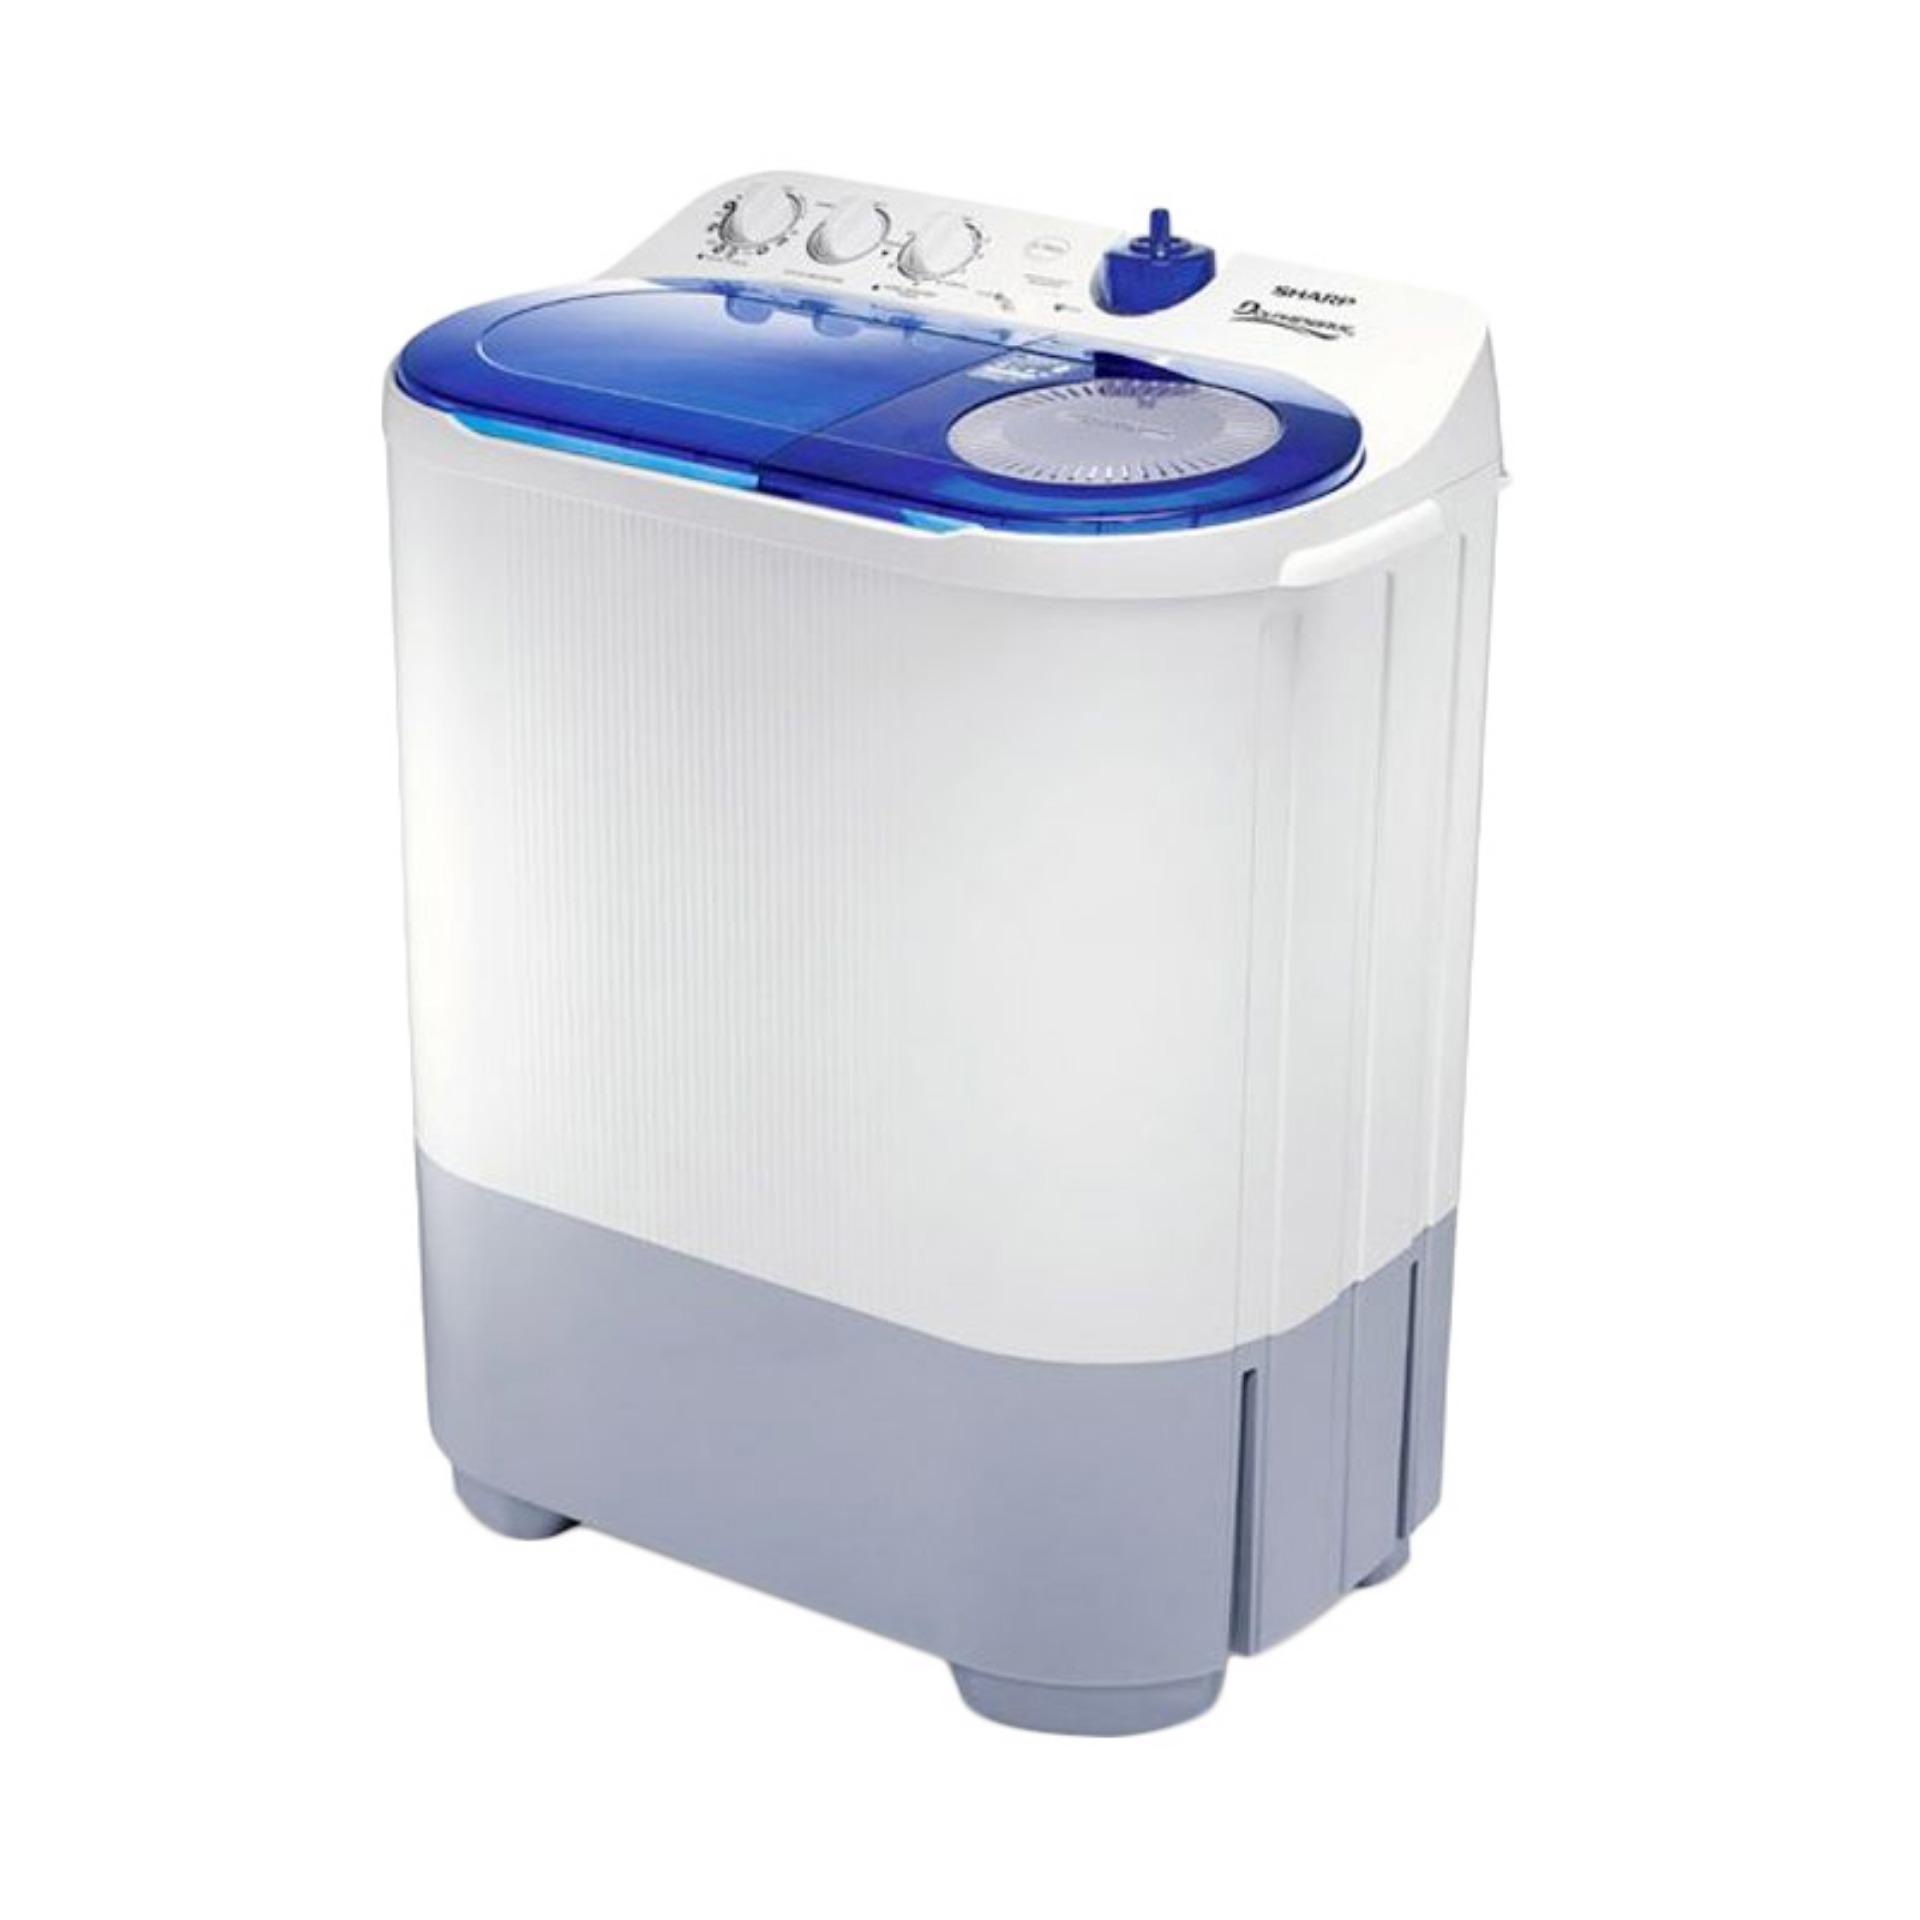 Sharp Mesin Cuci 2 Tabung 6 Kg Est 65mw Neutral Daftar Harga Puremagic Es T65mw Gk 65 Hijau 77 Da Bk Putih